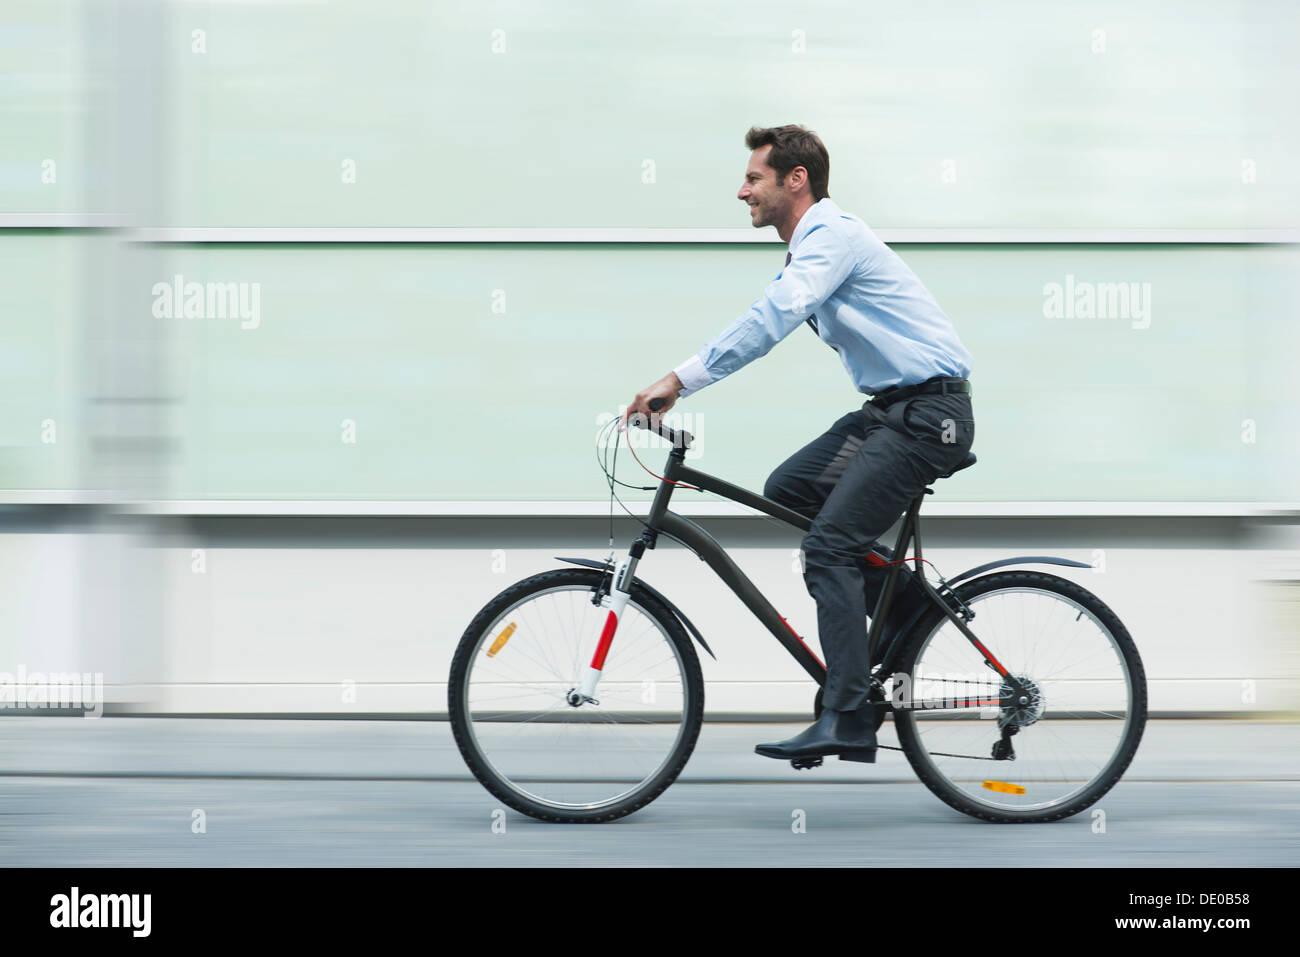 Empresario montando bicicleta Foto de stock